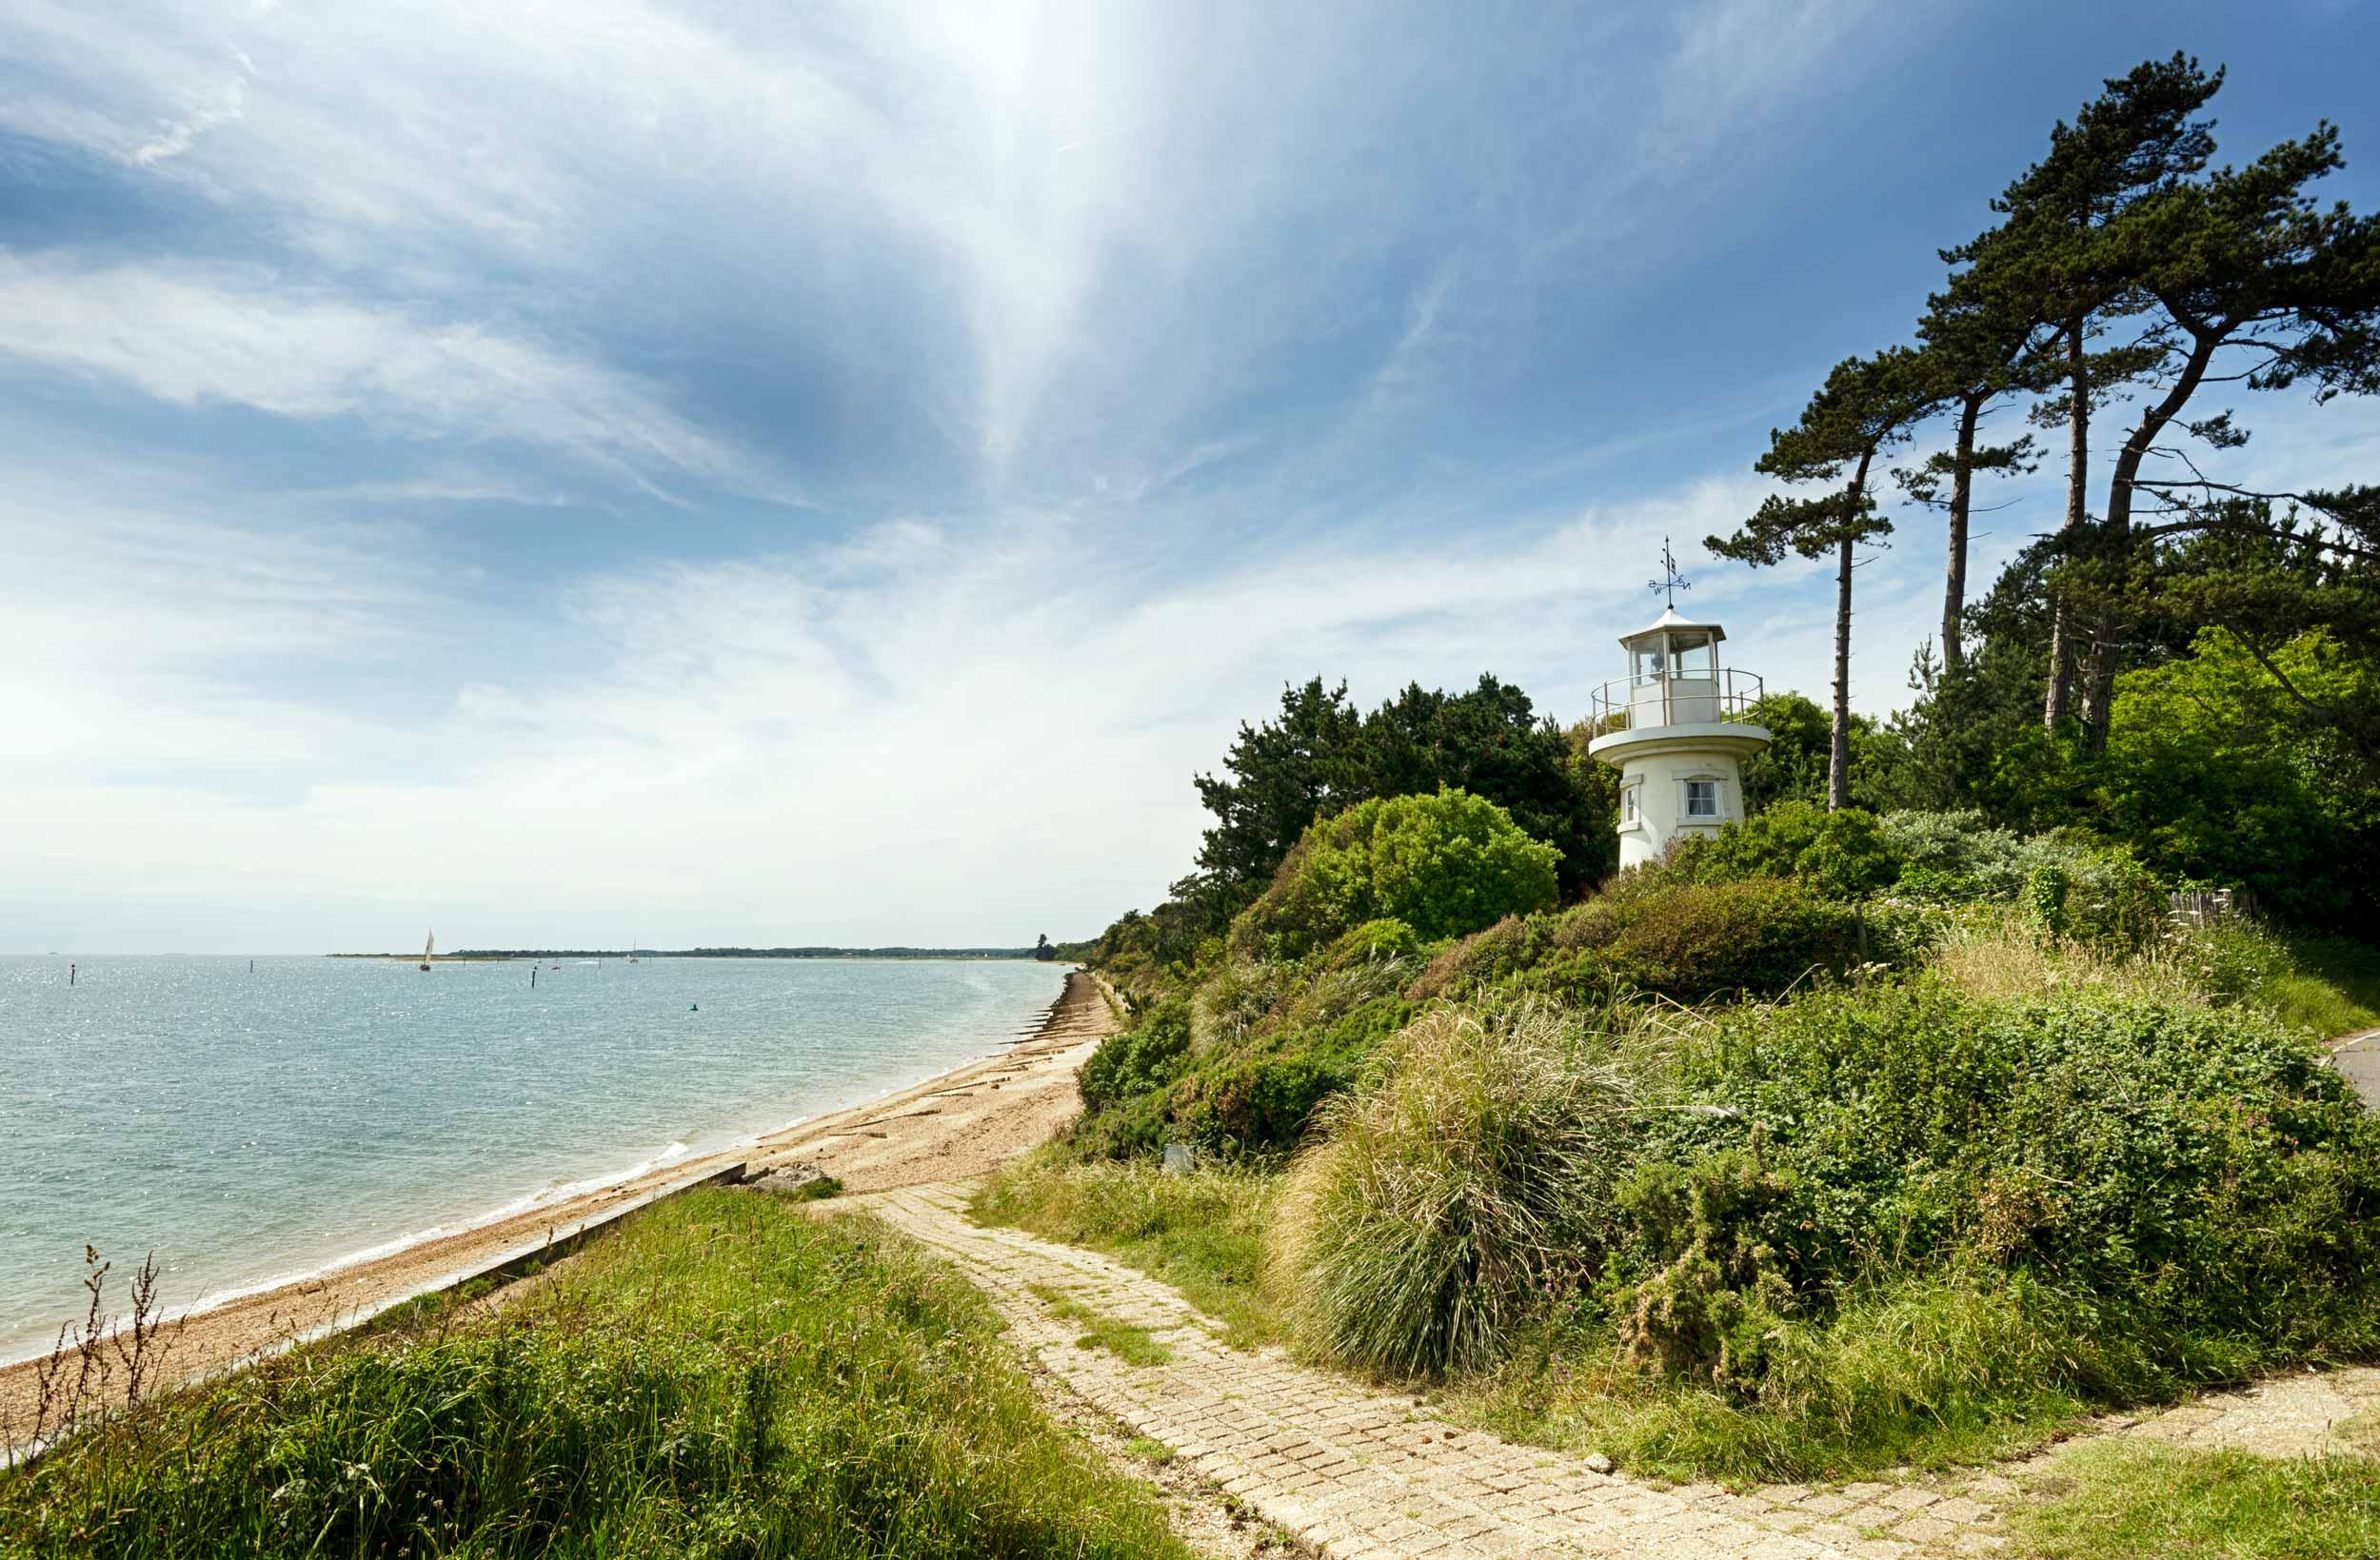 Lepe Lighthouse, New Forest, England  (Helen Hotson/Shutterstock)